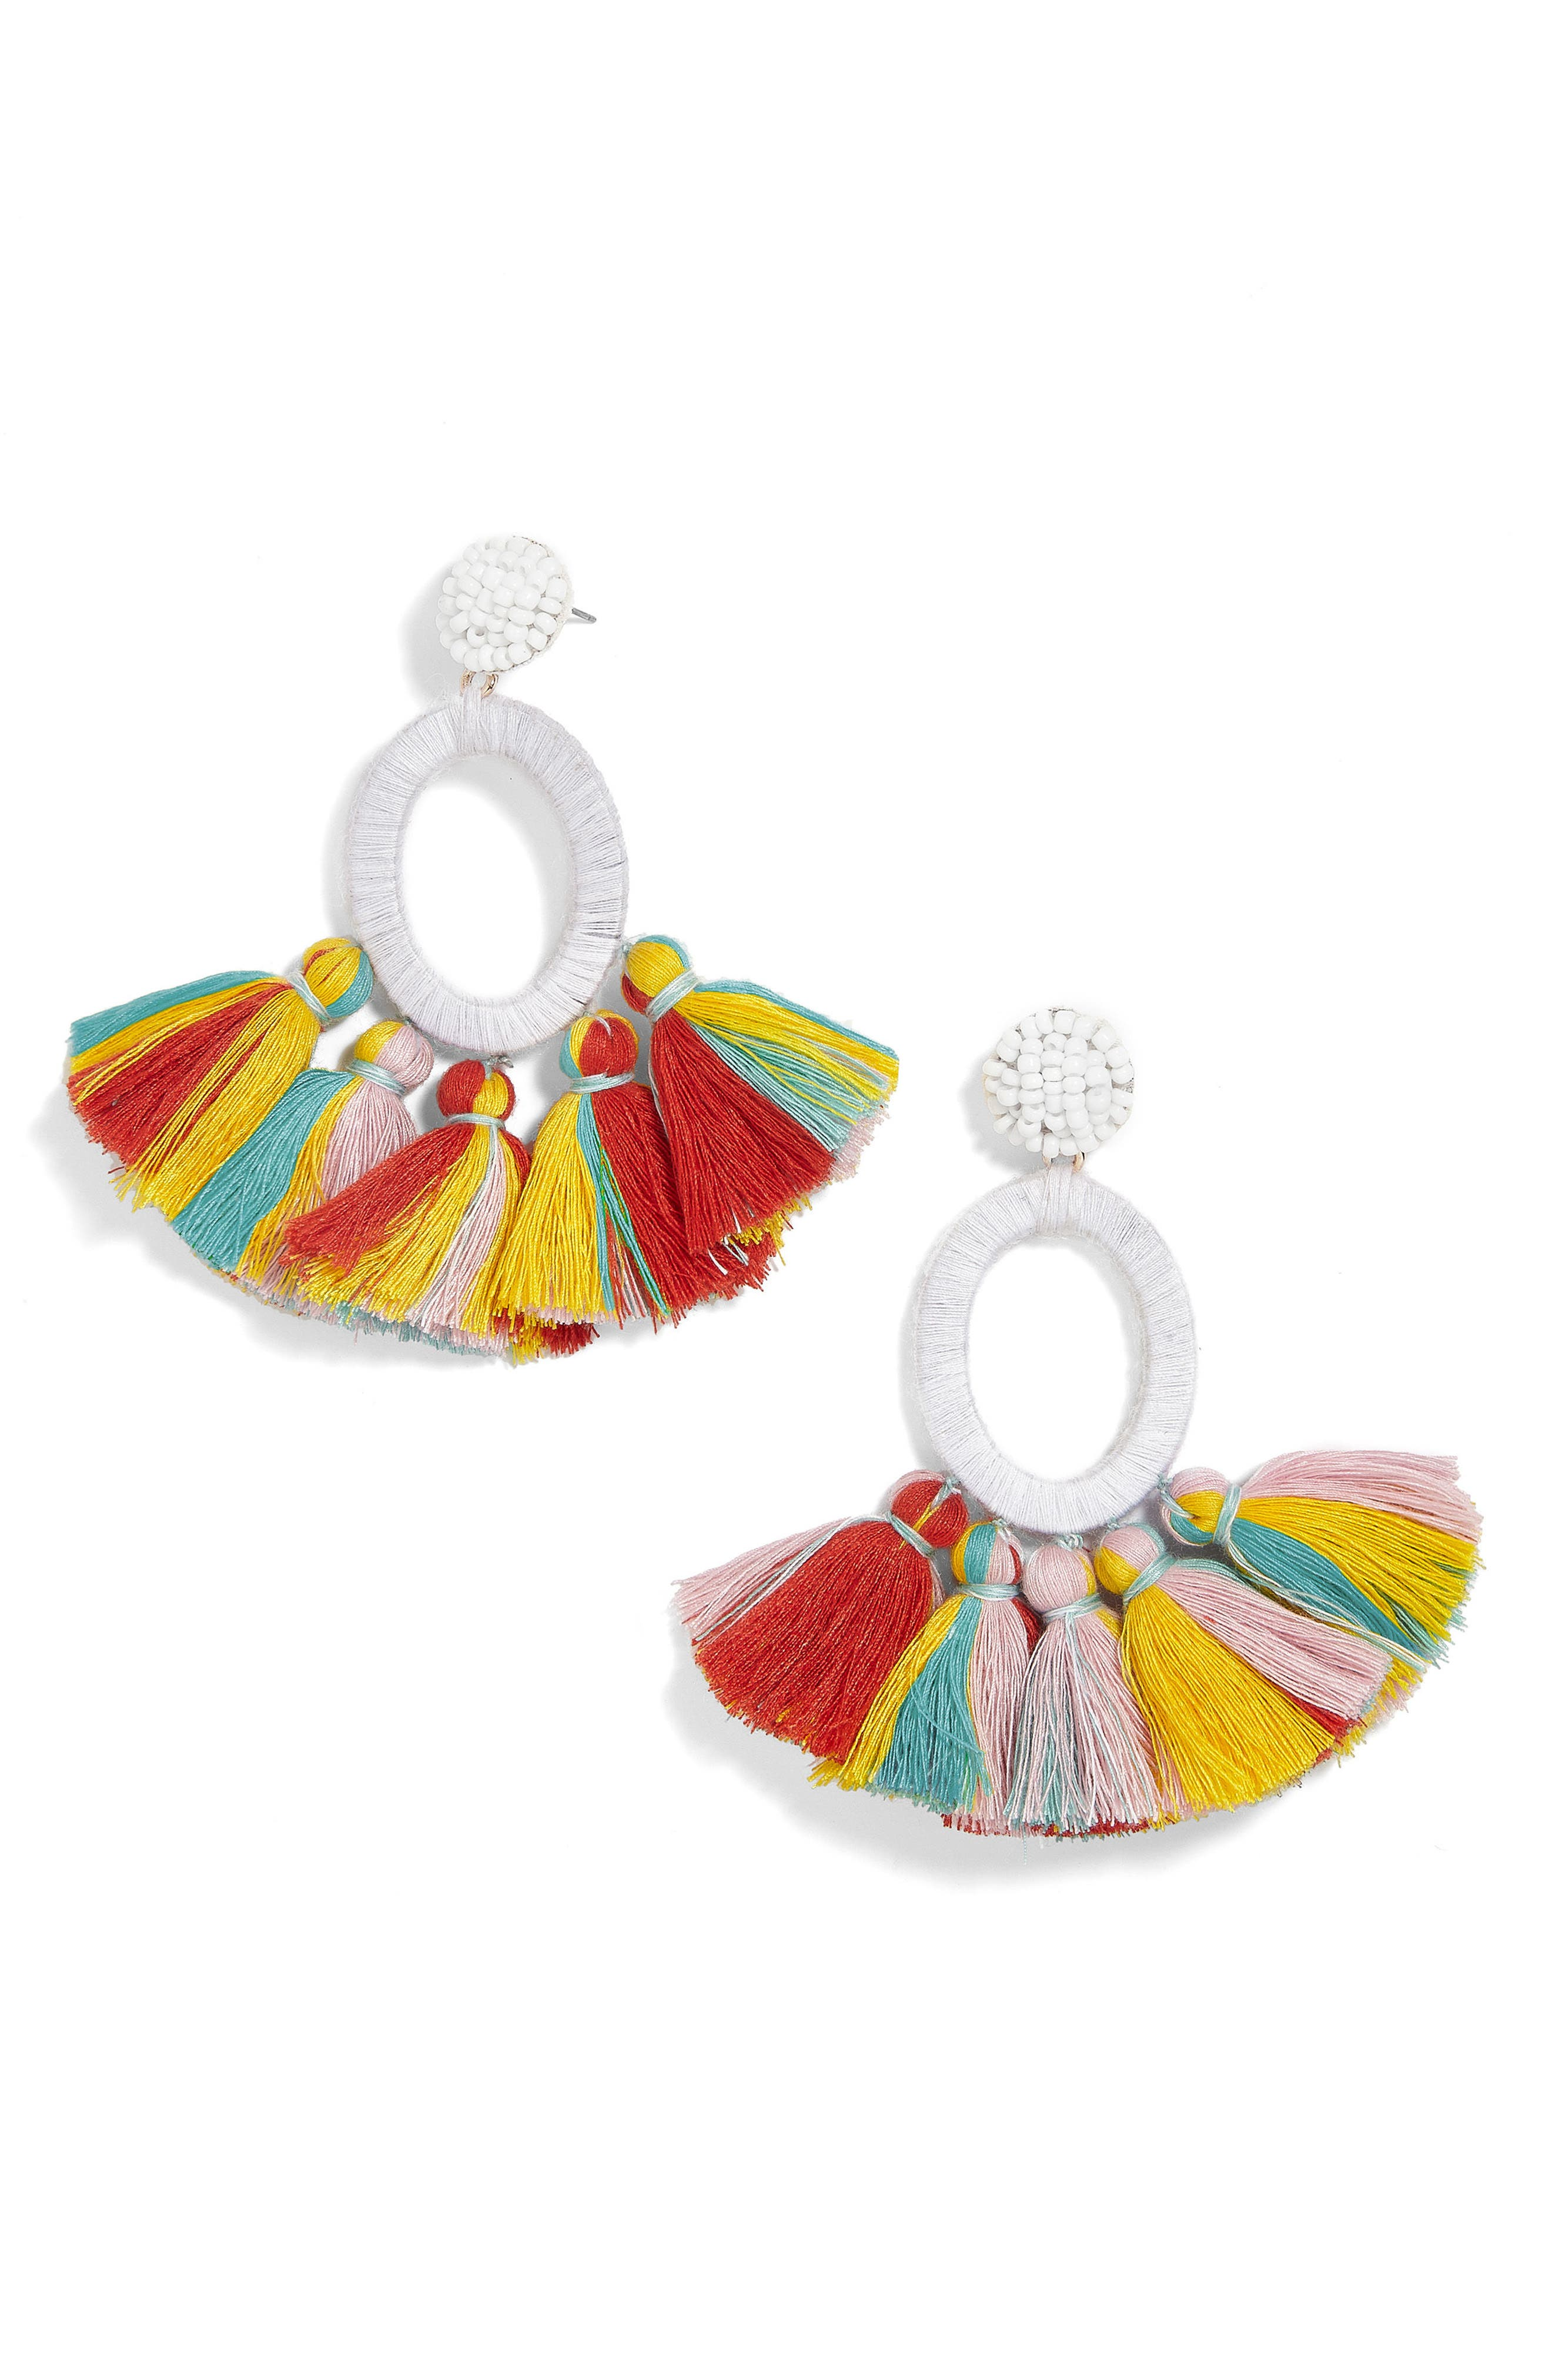 Abacos Tassel Earrings,                             Main thumbnail 1, color,                             159